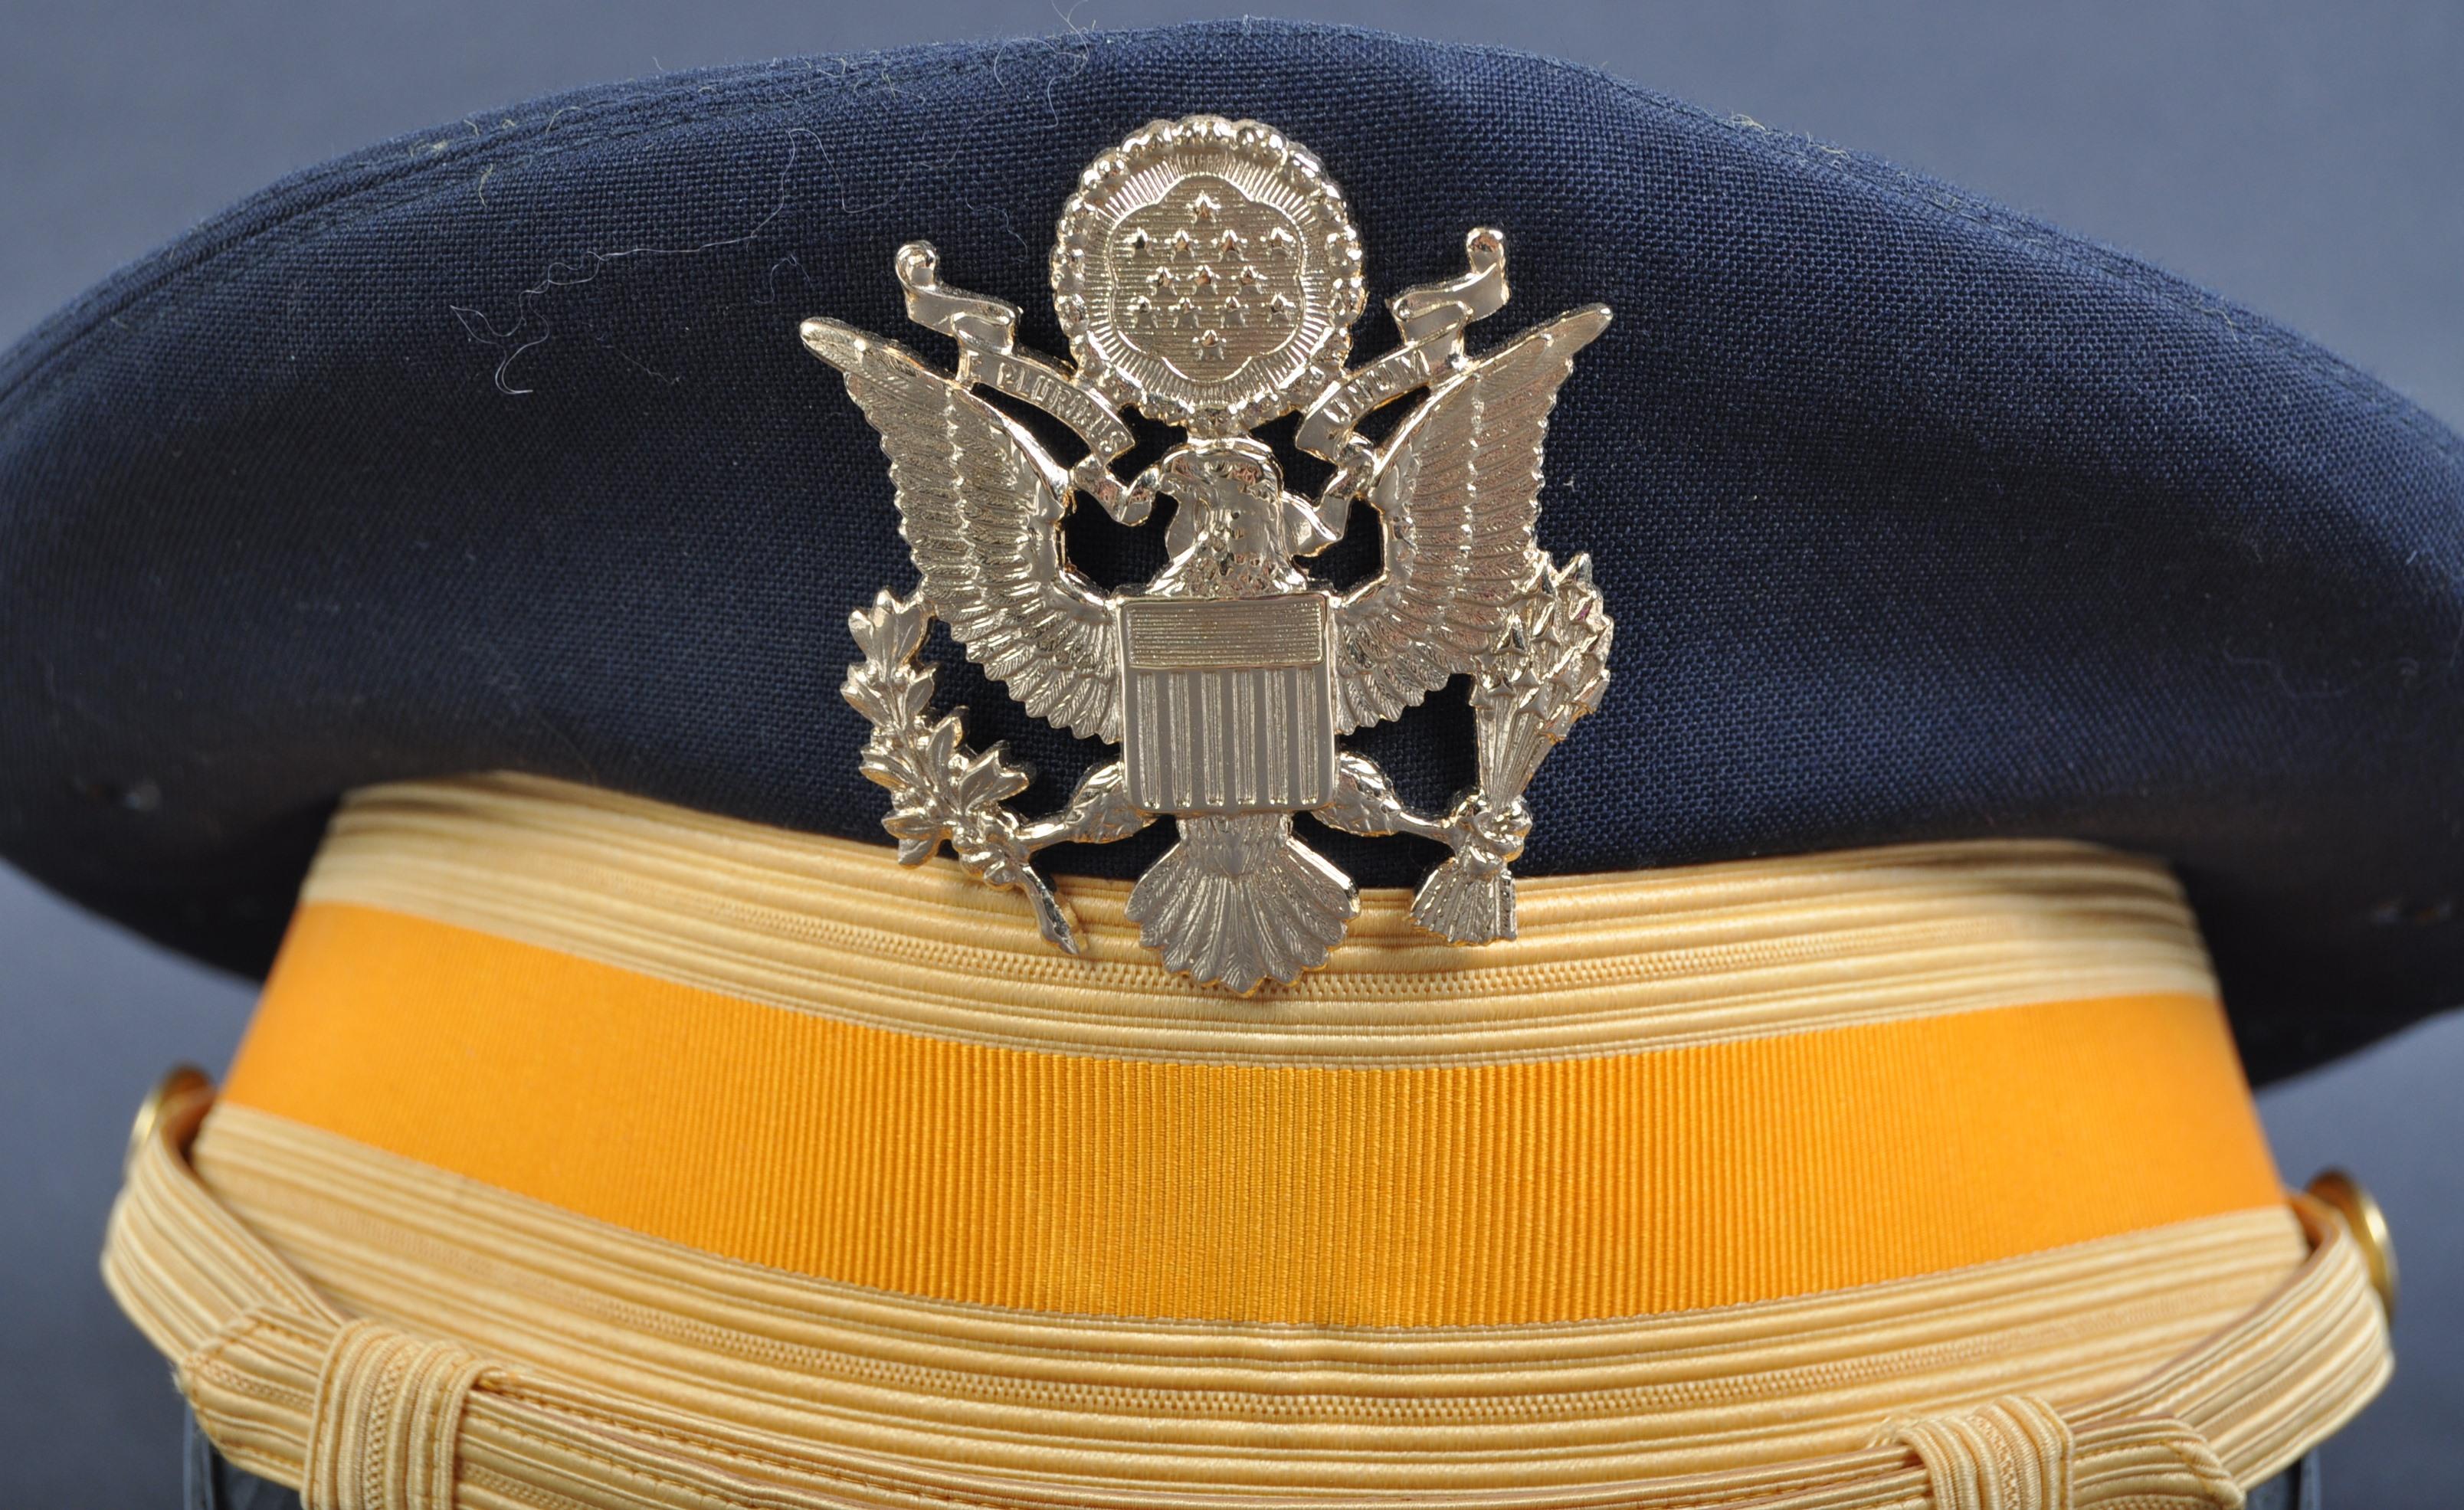 20TH CENTURY US CAVALRY OFFICER'S BANCROFT UNIFORM PEAKED CAP - Image 2 of 5